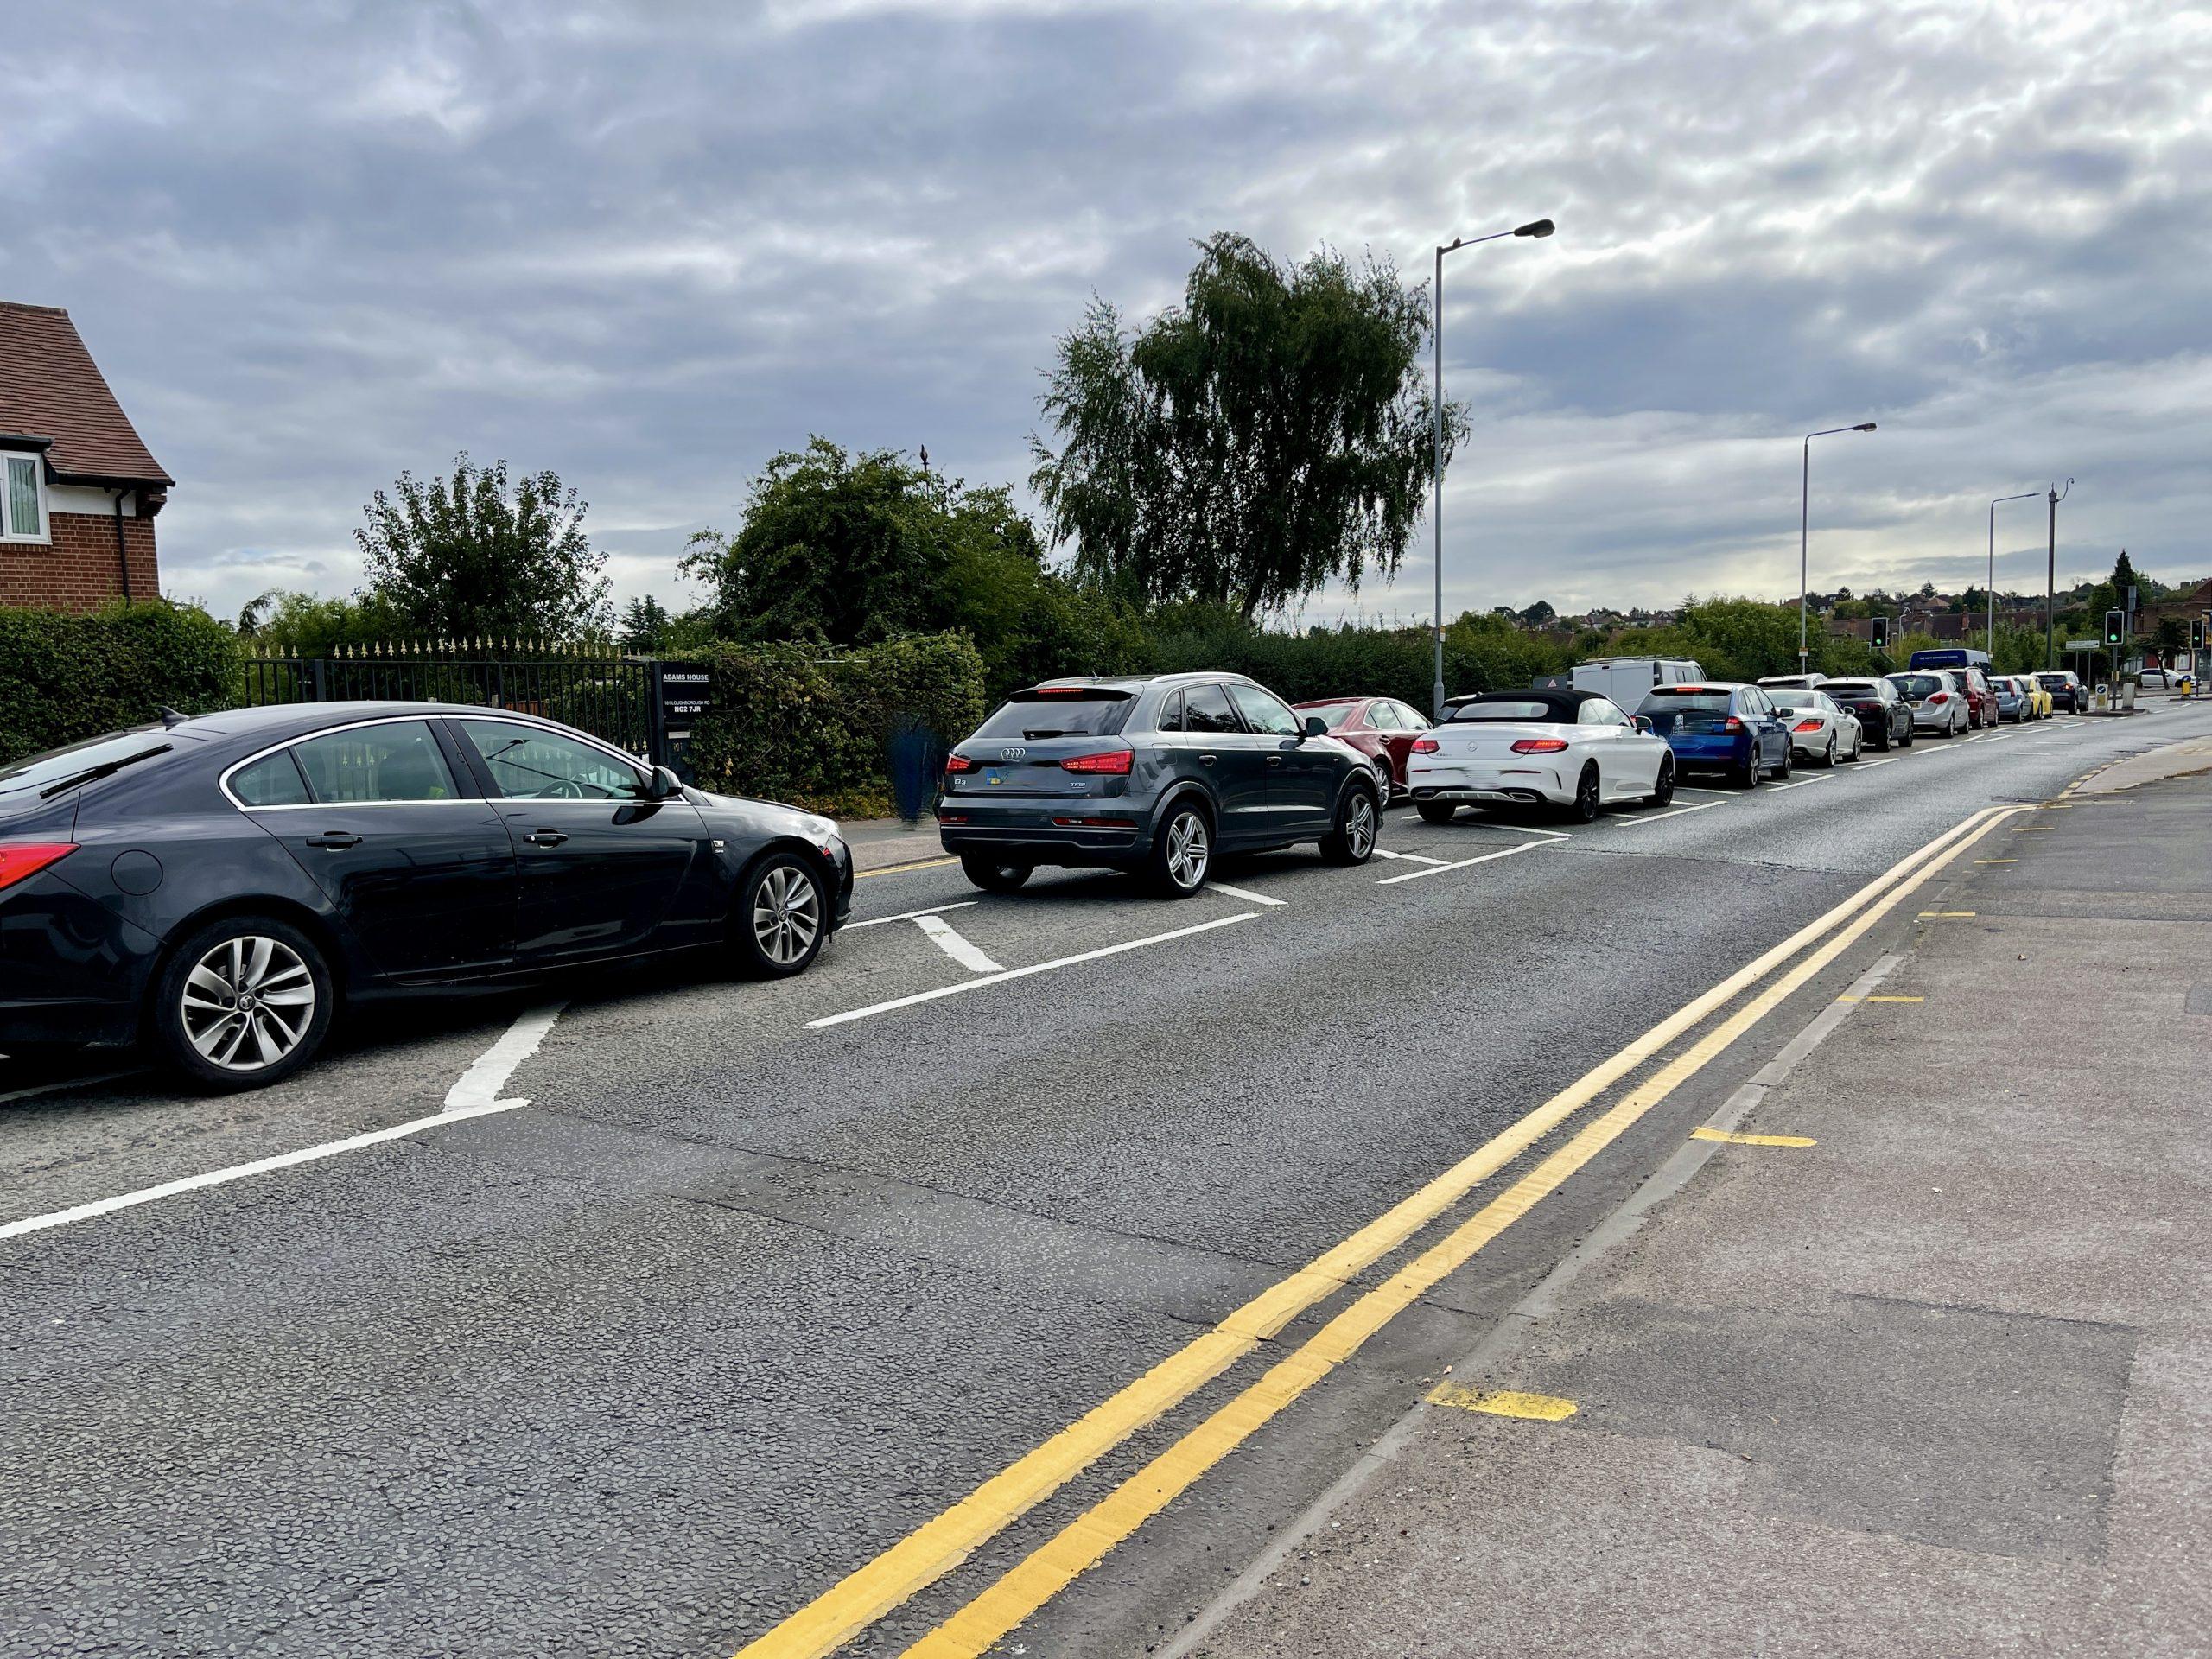 Queues on Loughborough Road West Bridgford for ASDA fuel © westbridgfordwire.com